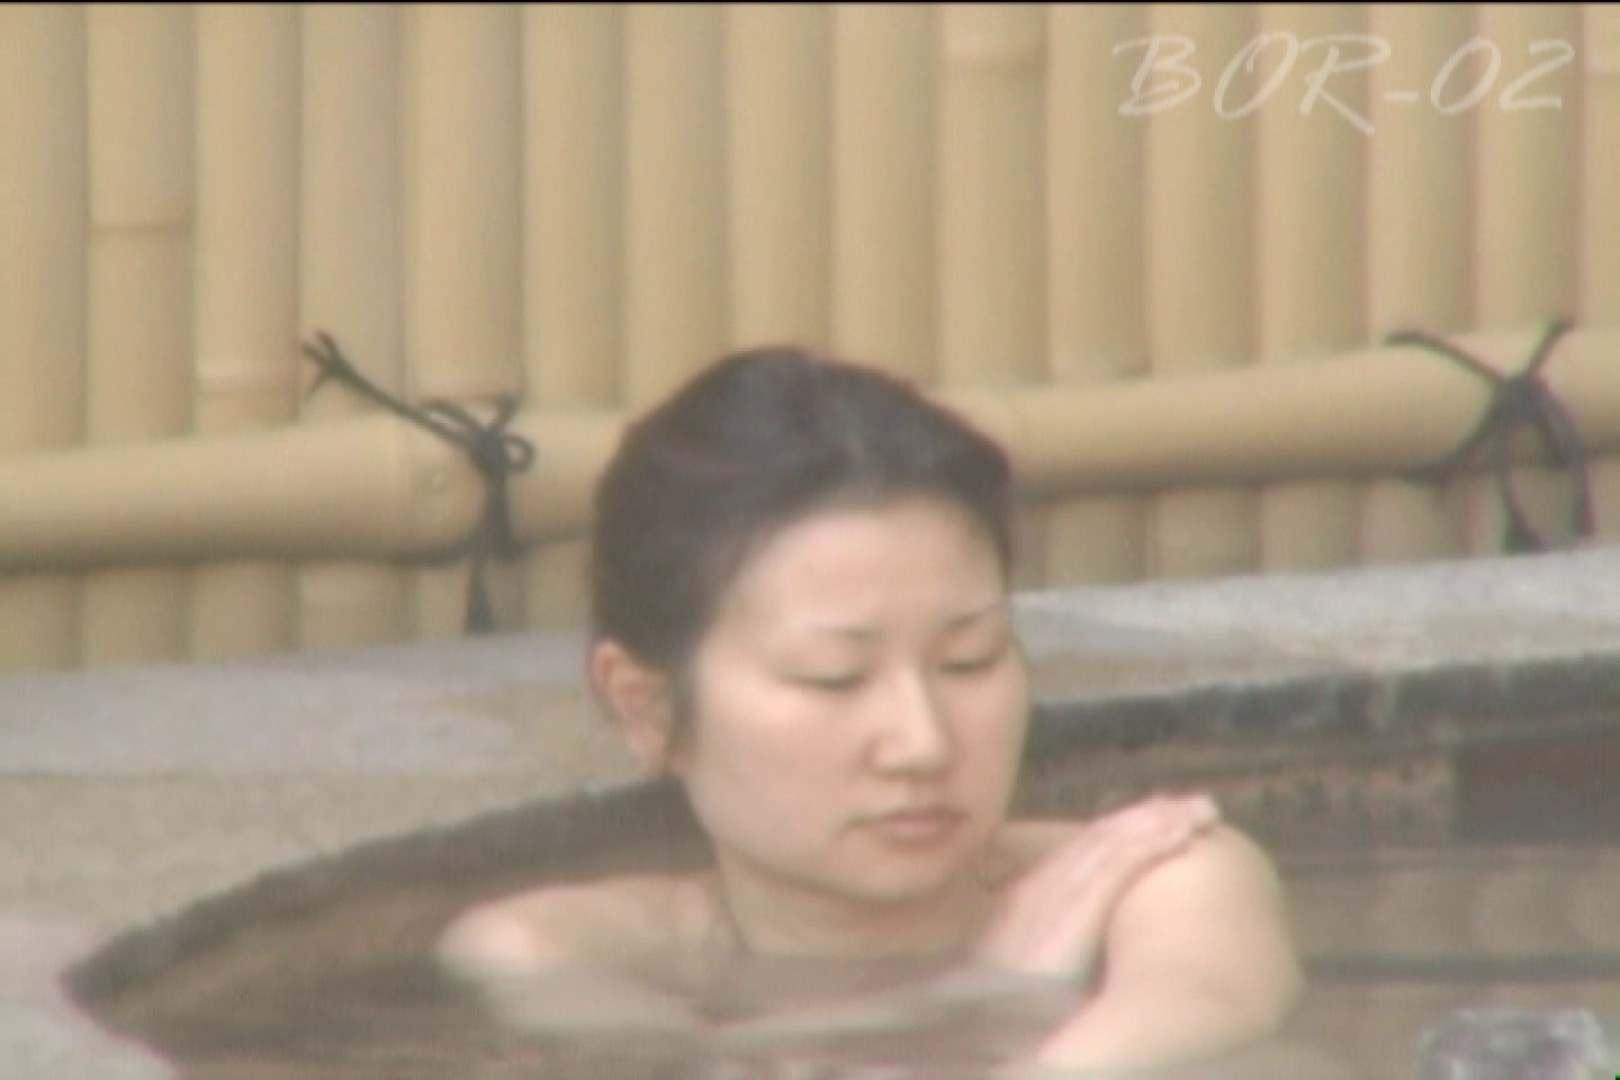 Aquaな露天風呂Vol.477 露天 アダルト動画キャプチャ 99PICs 2